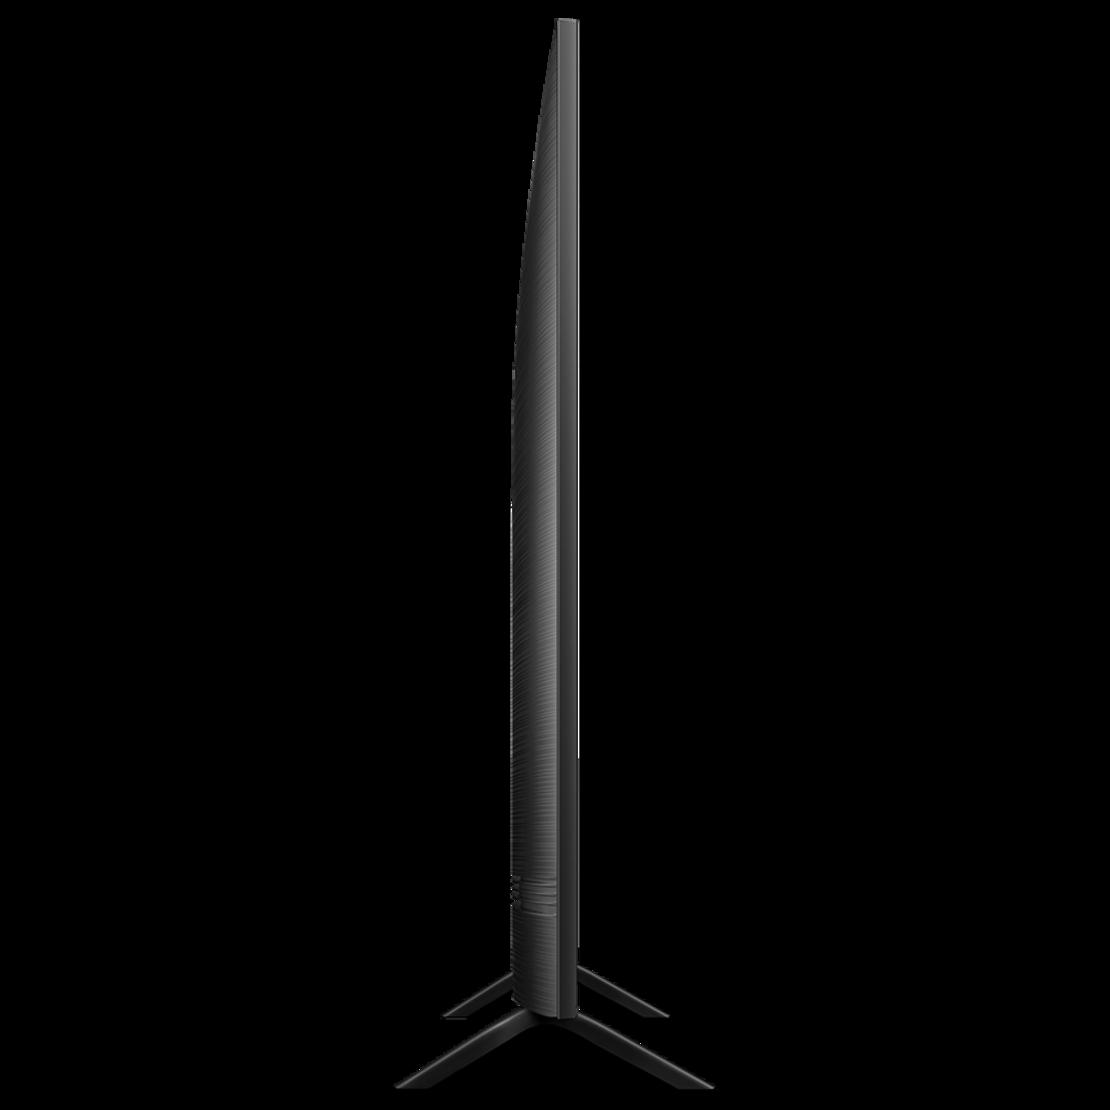 טלוויזיה Samsung 50 4K דגם QE50Q60T